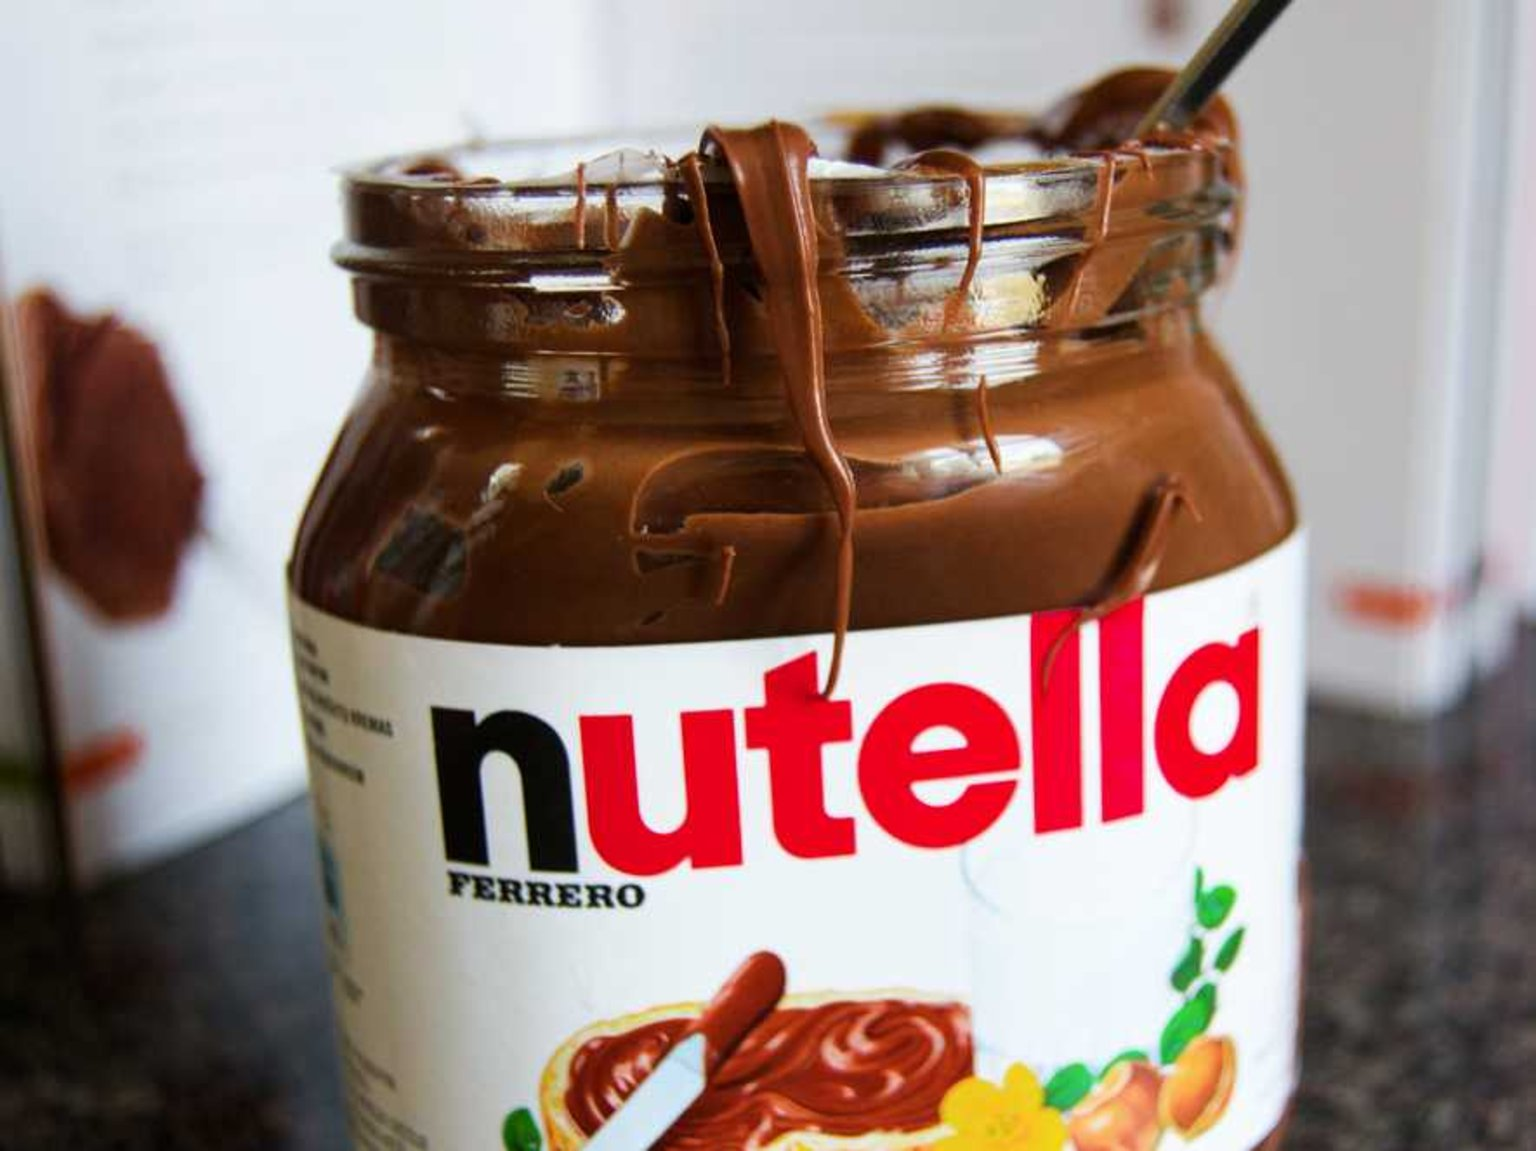 Nutella Maker Fights Back Against Fears of Cancer Risk